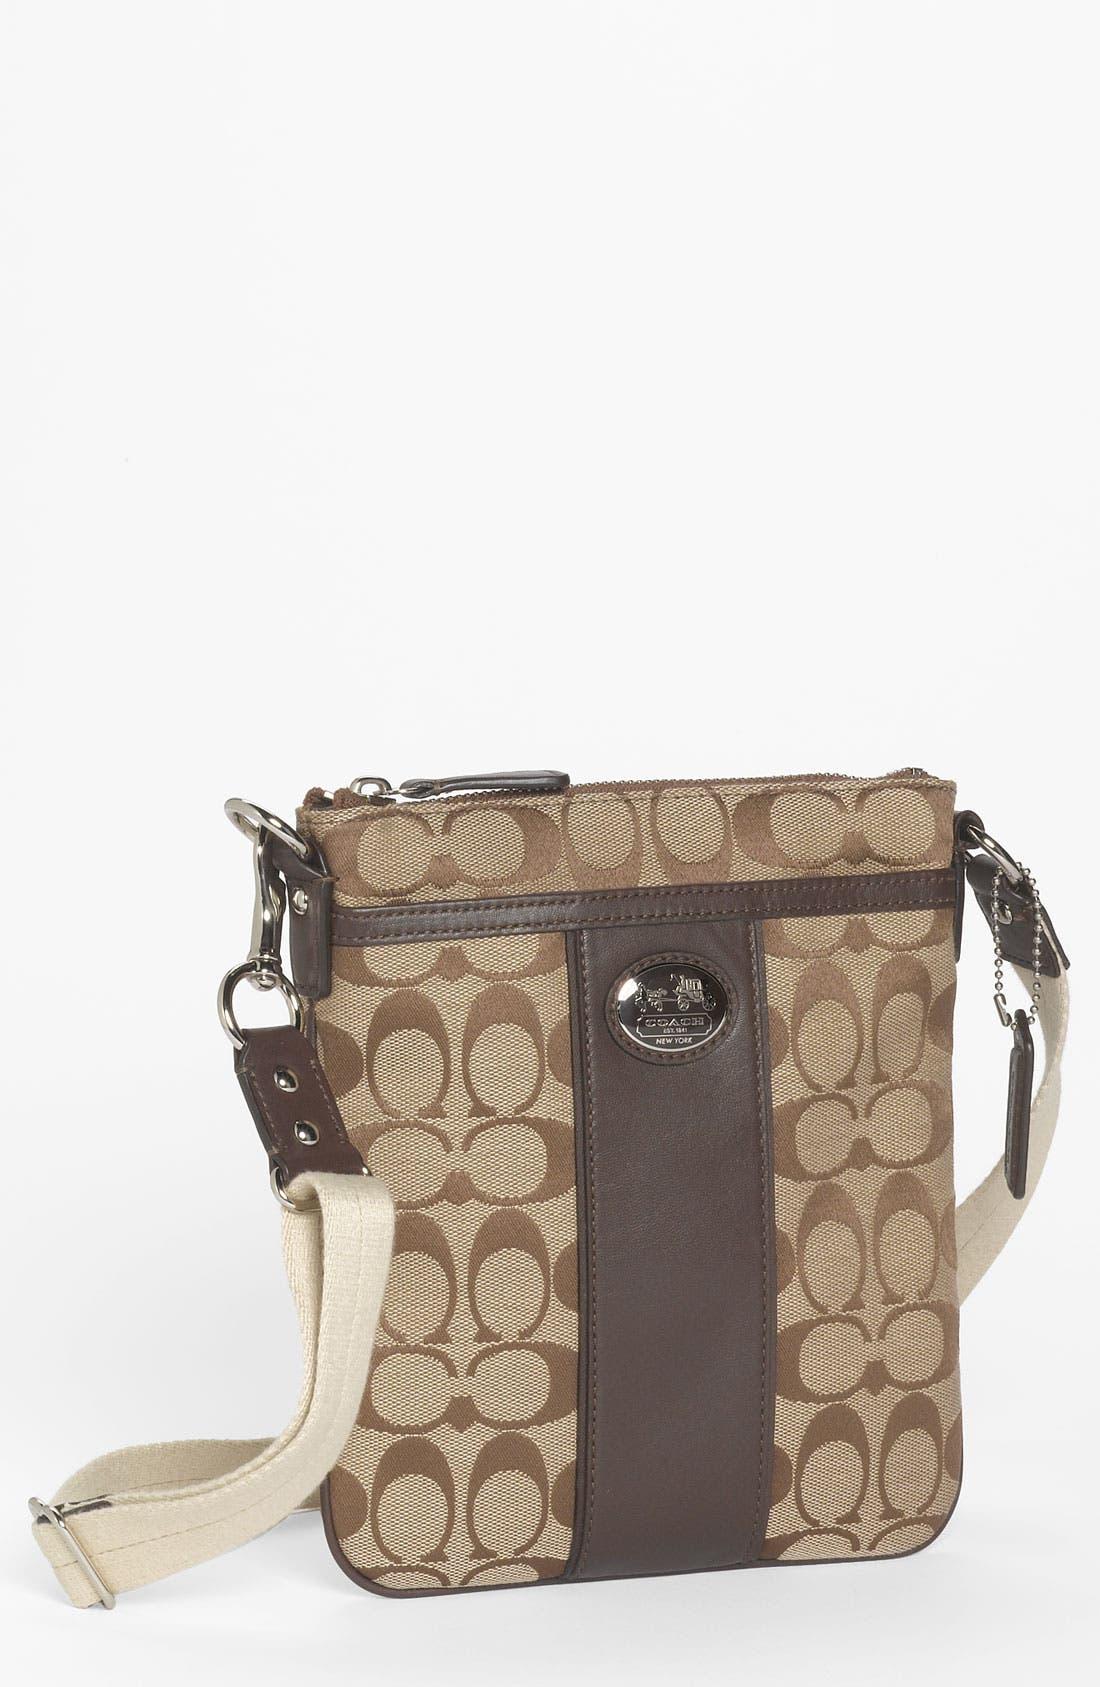 Alternate Image 1 Selected - COACH 'Sutton Signature - Swingpack' Crossbody Bag